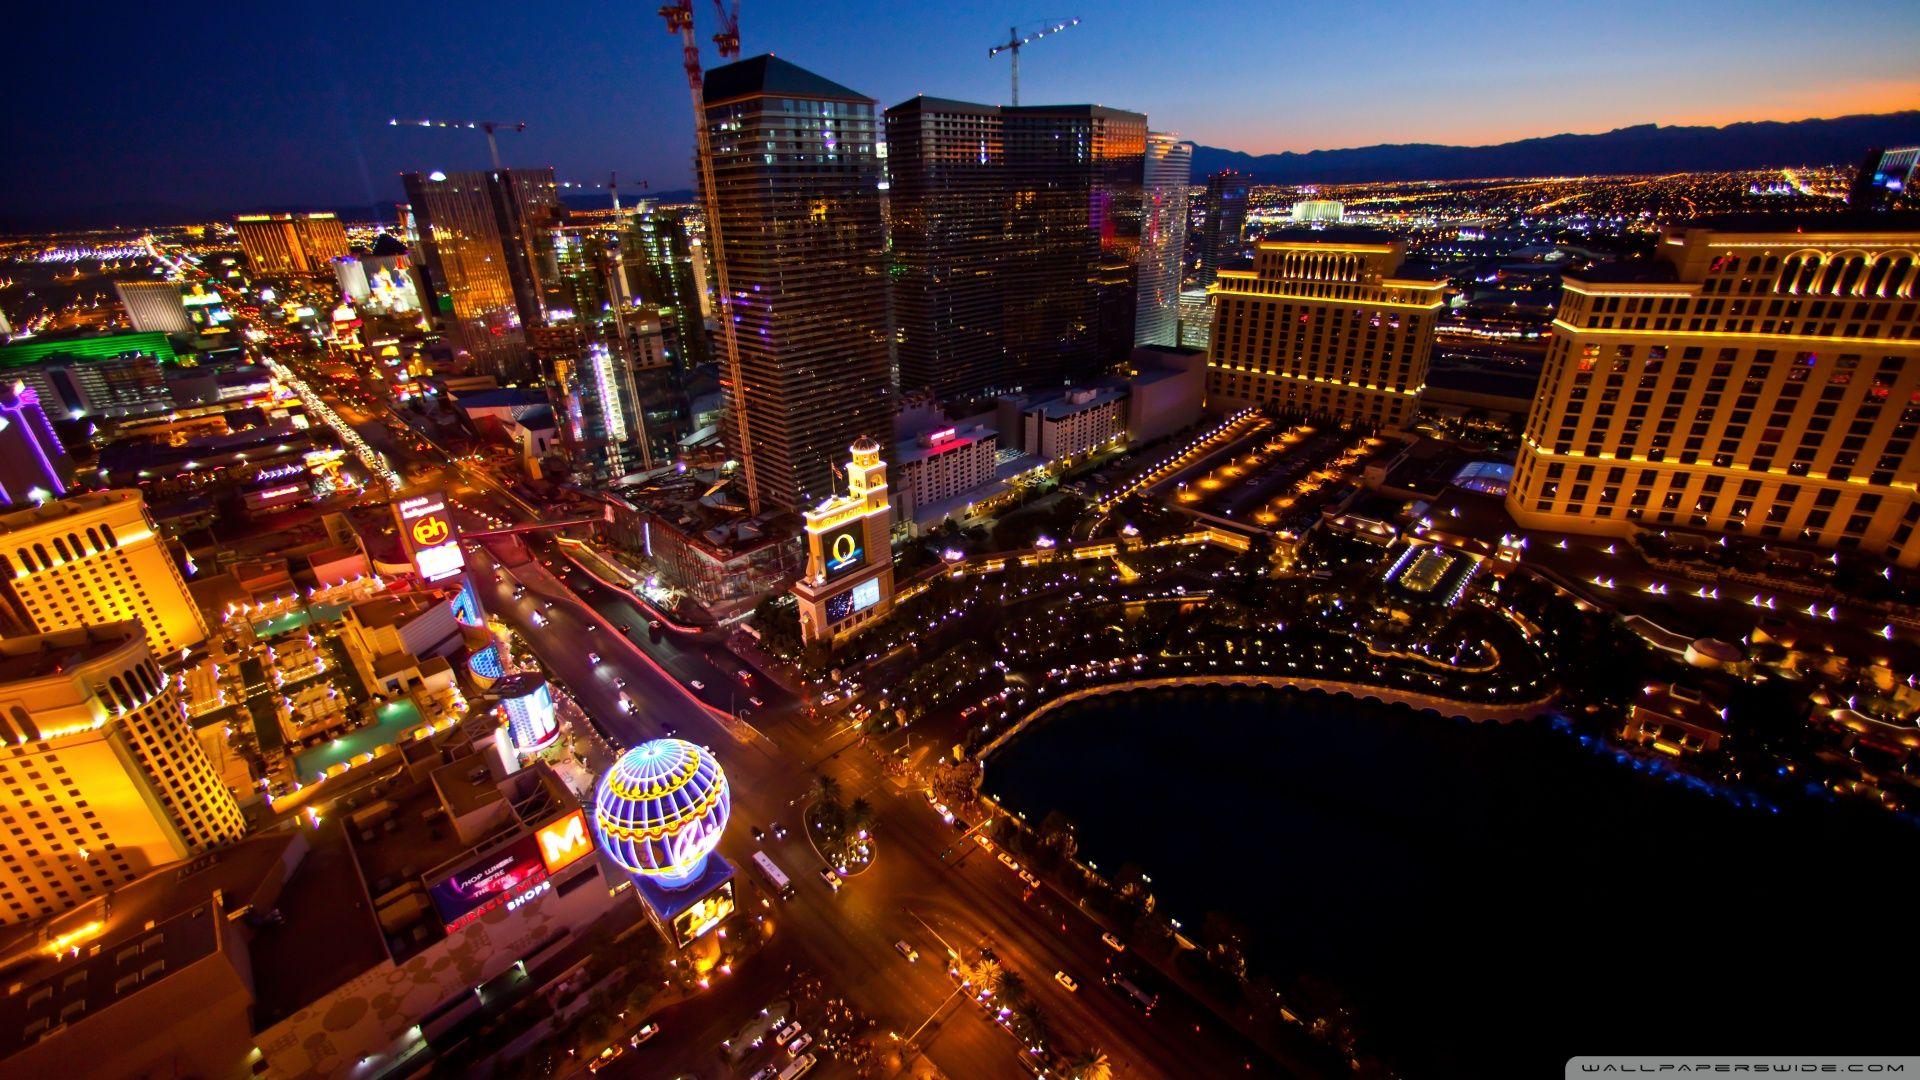 Vegas Background Wallpaper HD